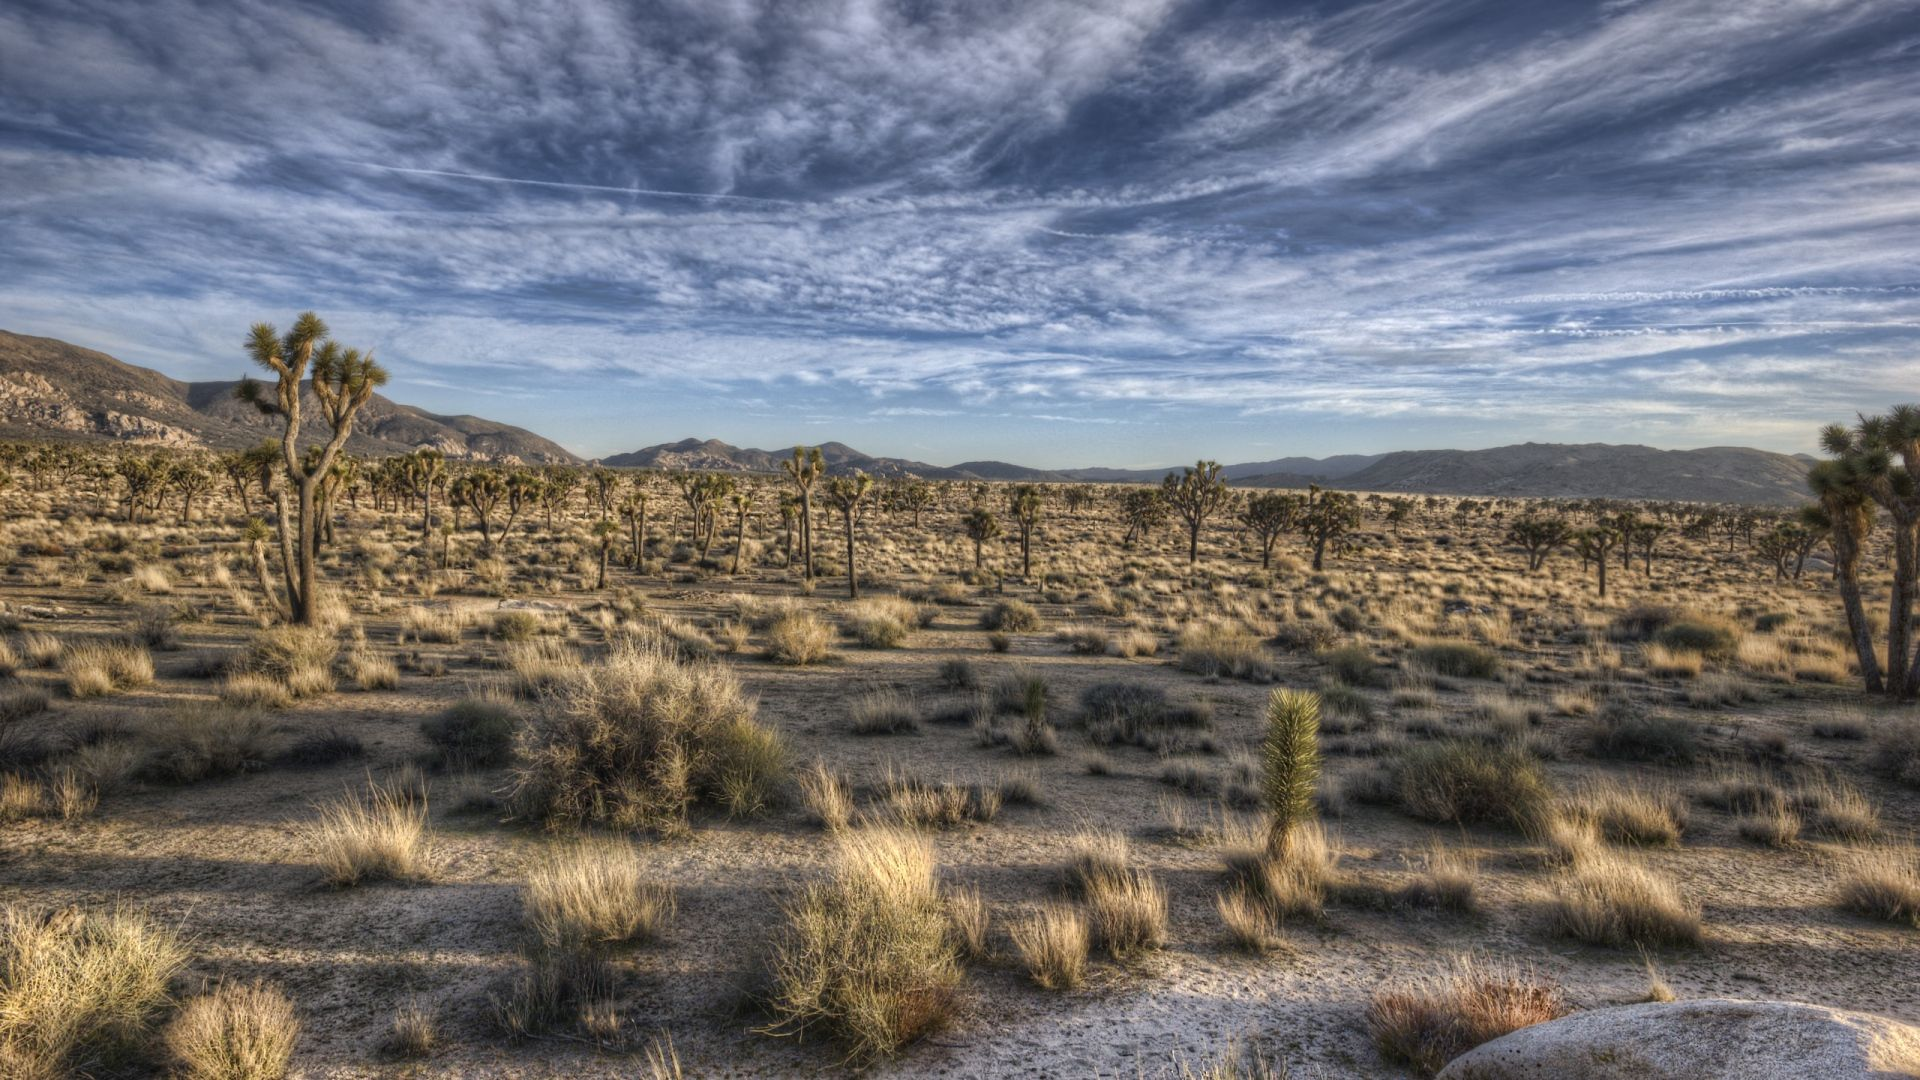 Desert Foothills Landscape free picture